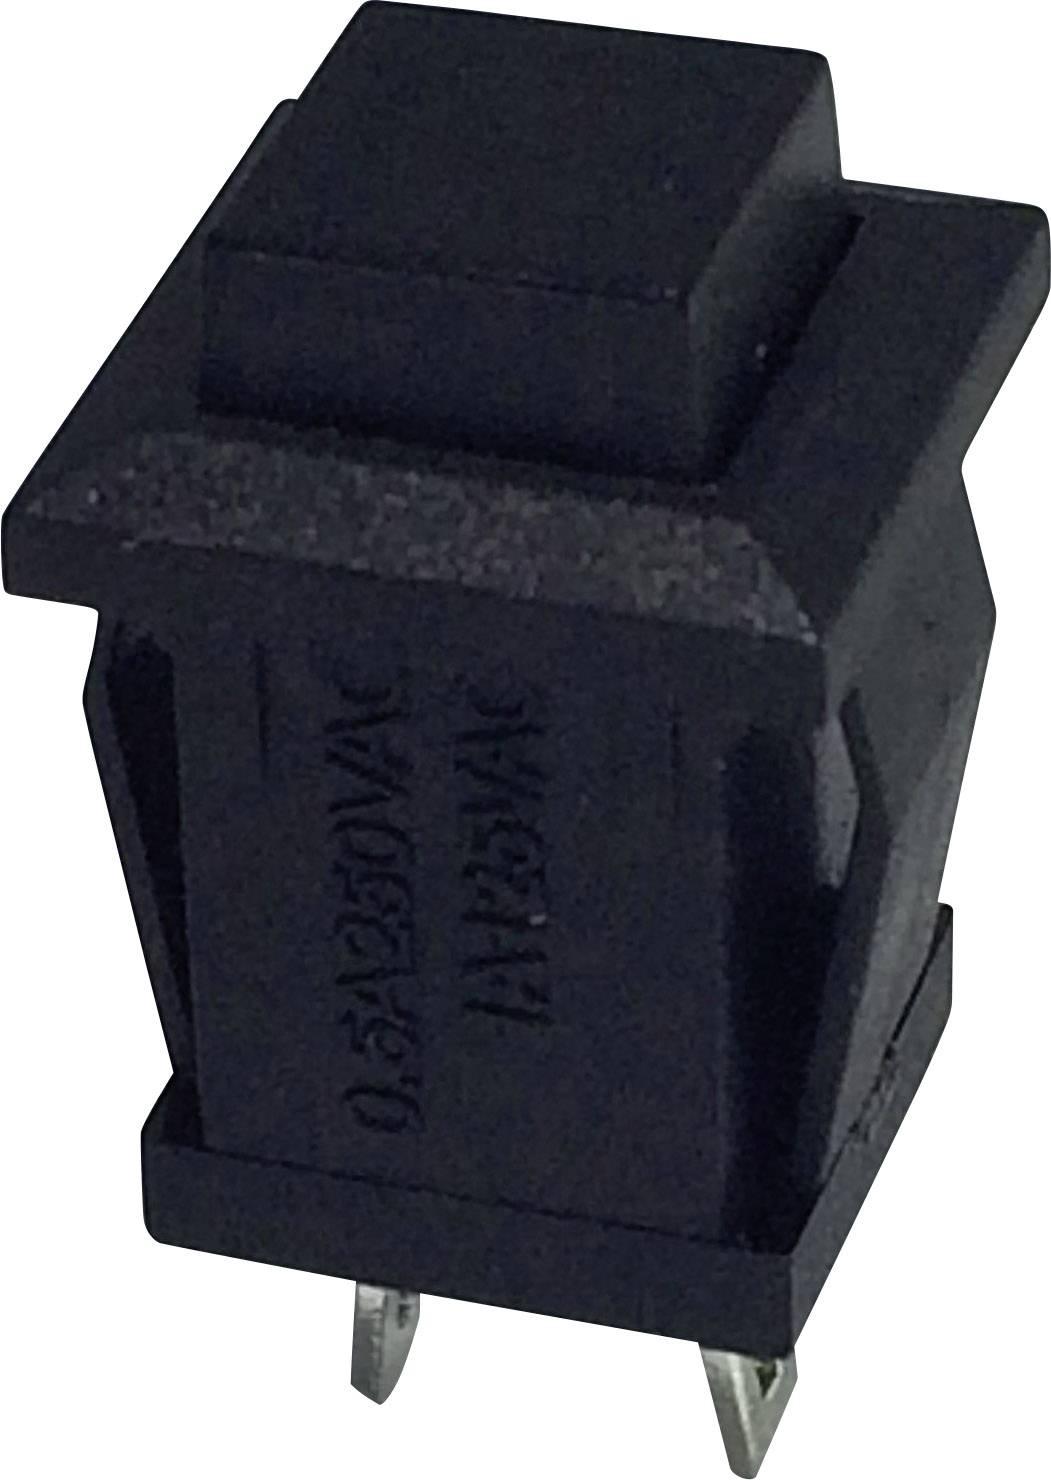 Tlačidlo TRU COMPONENTS TC-R13-57B-05BK, 250 V/AC, 0.5 A, čierna, 1 ks